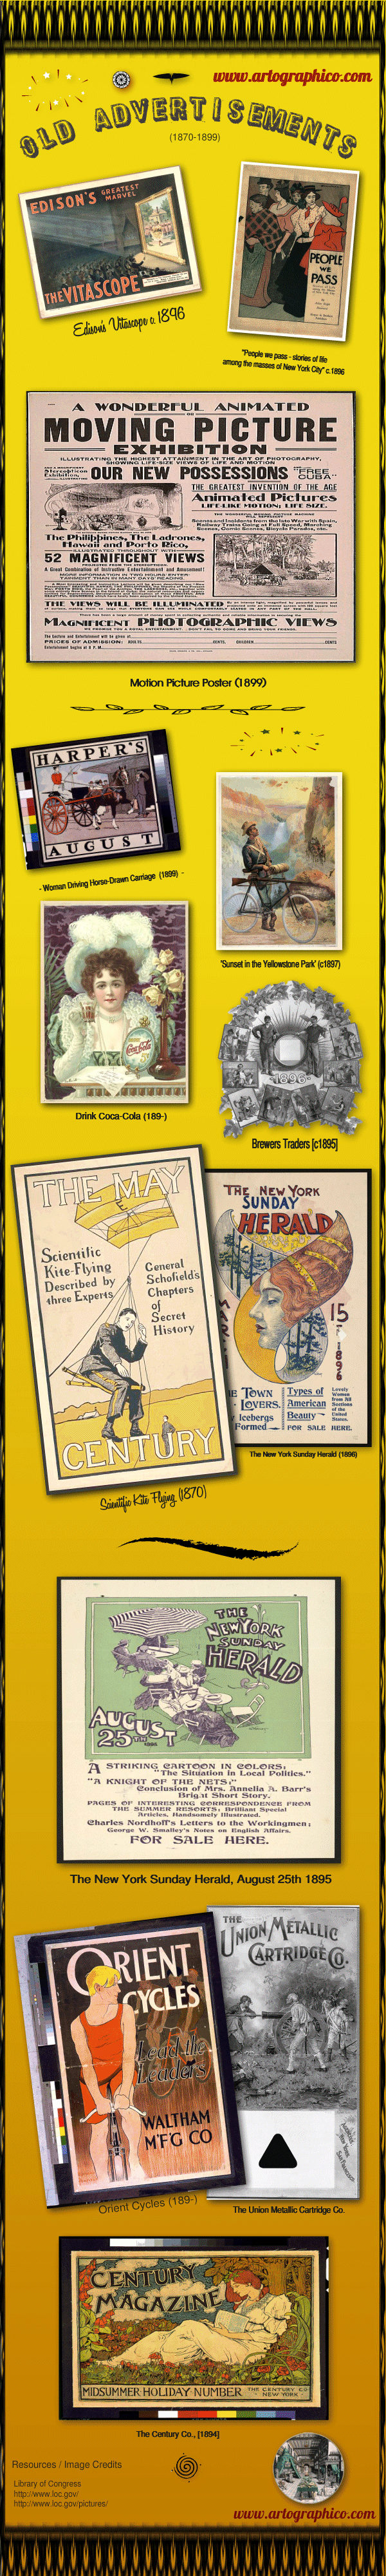 Vintage Ads Infographic - Artographic